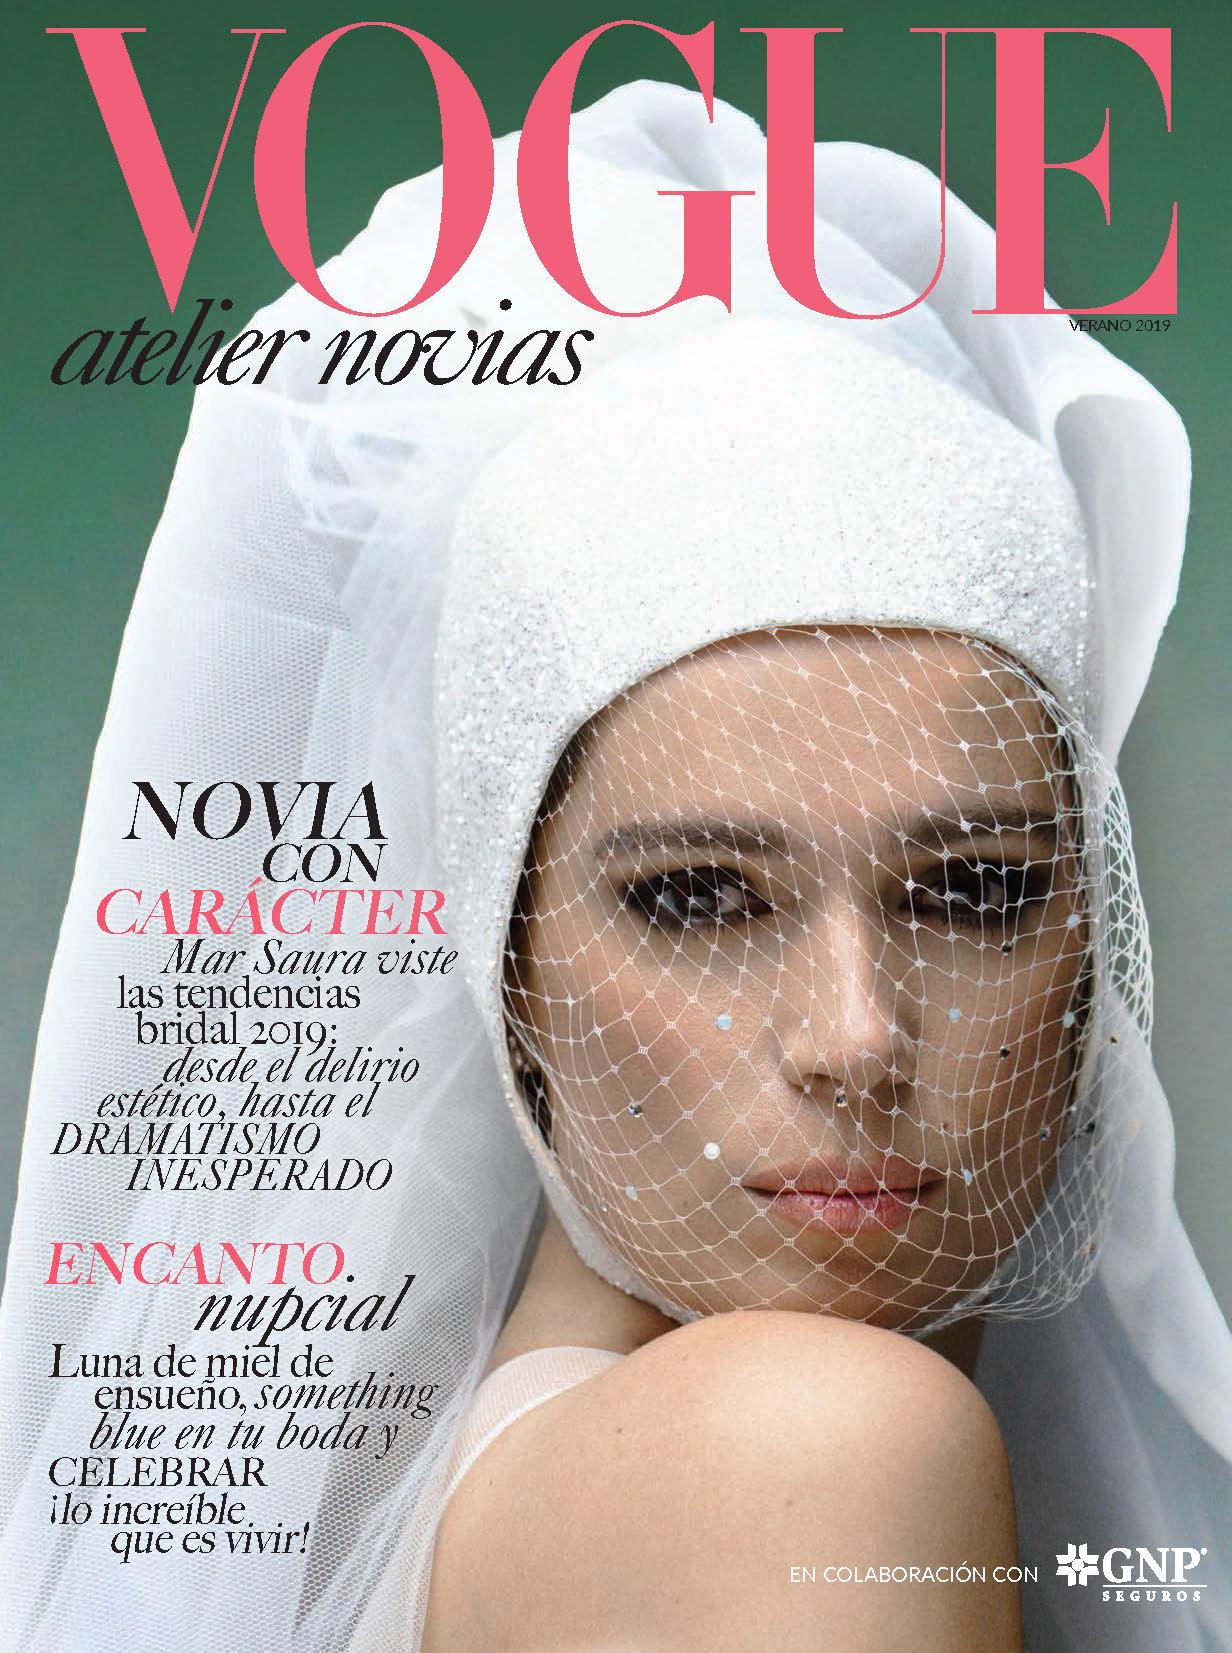 Vogue Mexico by Carlijn Jacobs